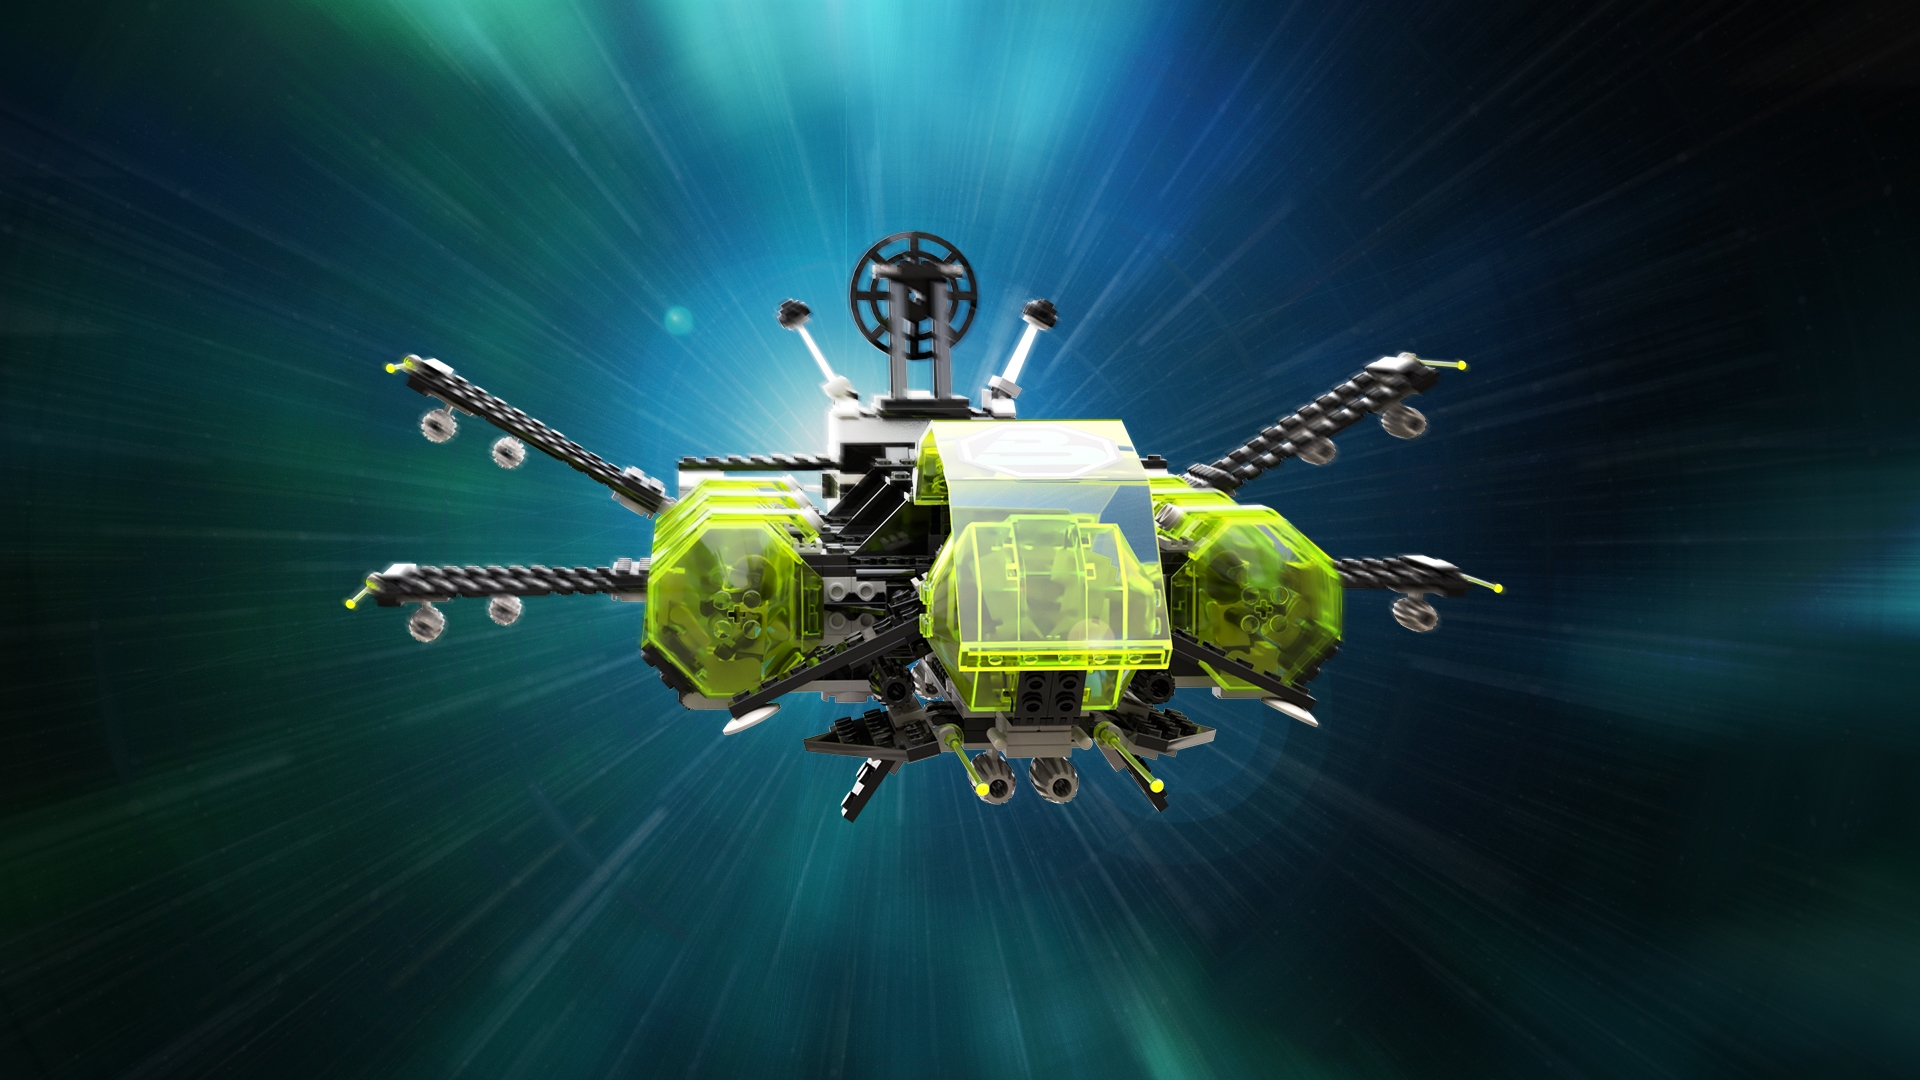 LEGO Blacktron 2 – AFIF Hyperspace jump